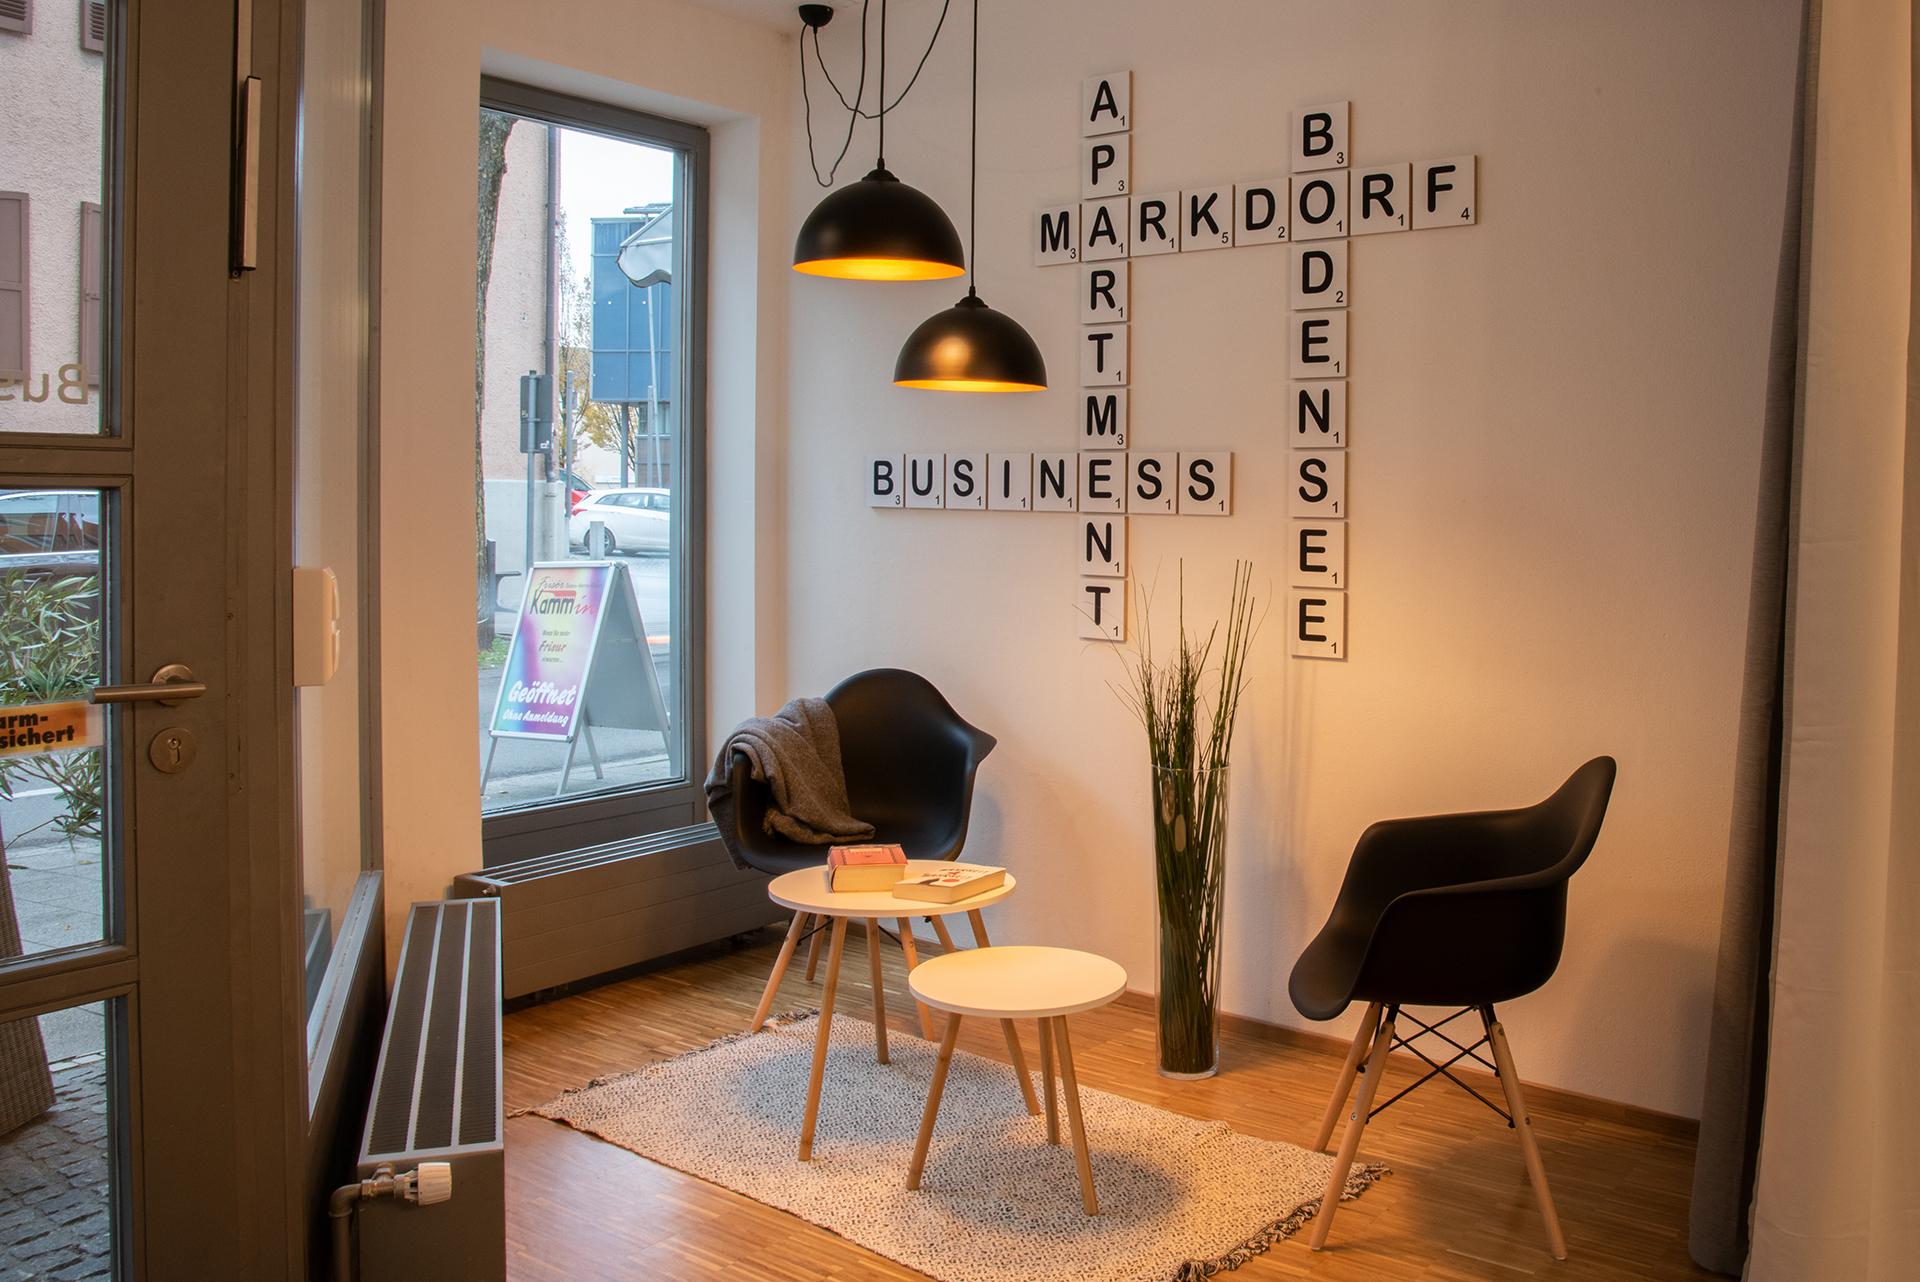 Business Apartment am Bodensee - Leseecke